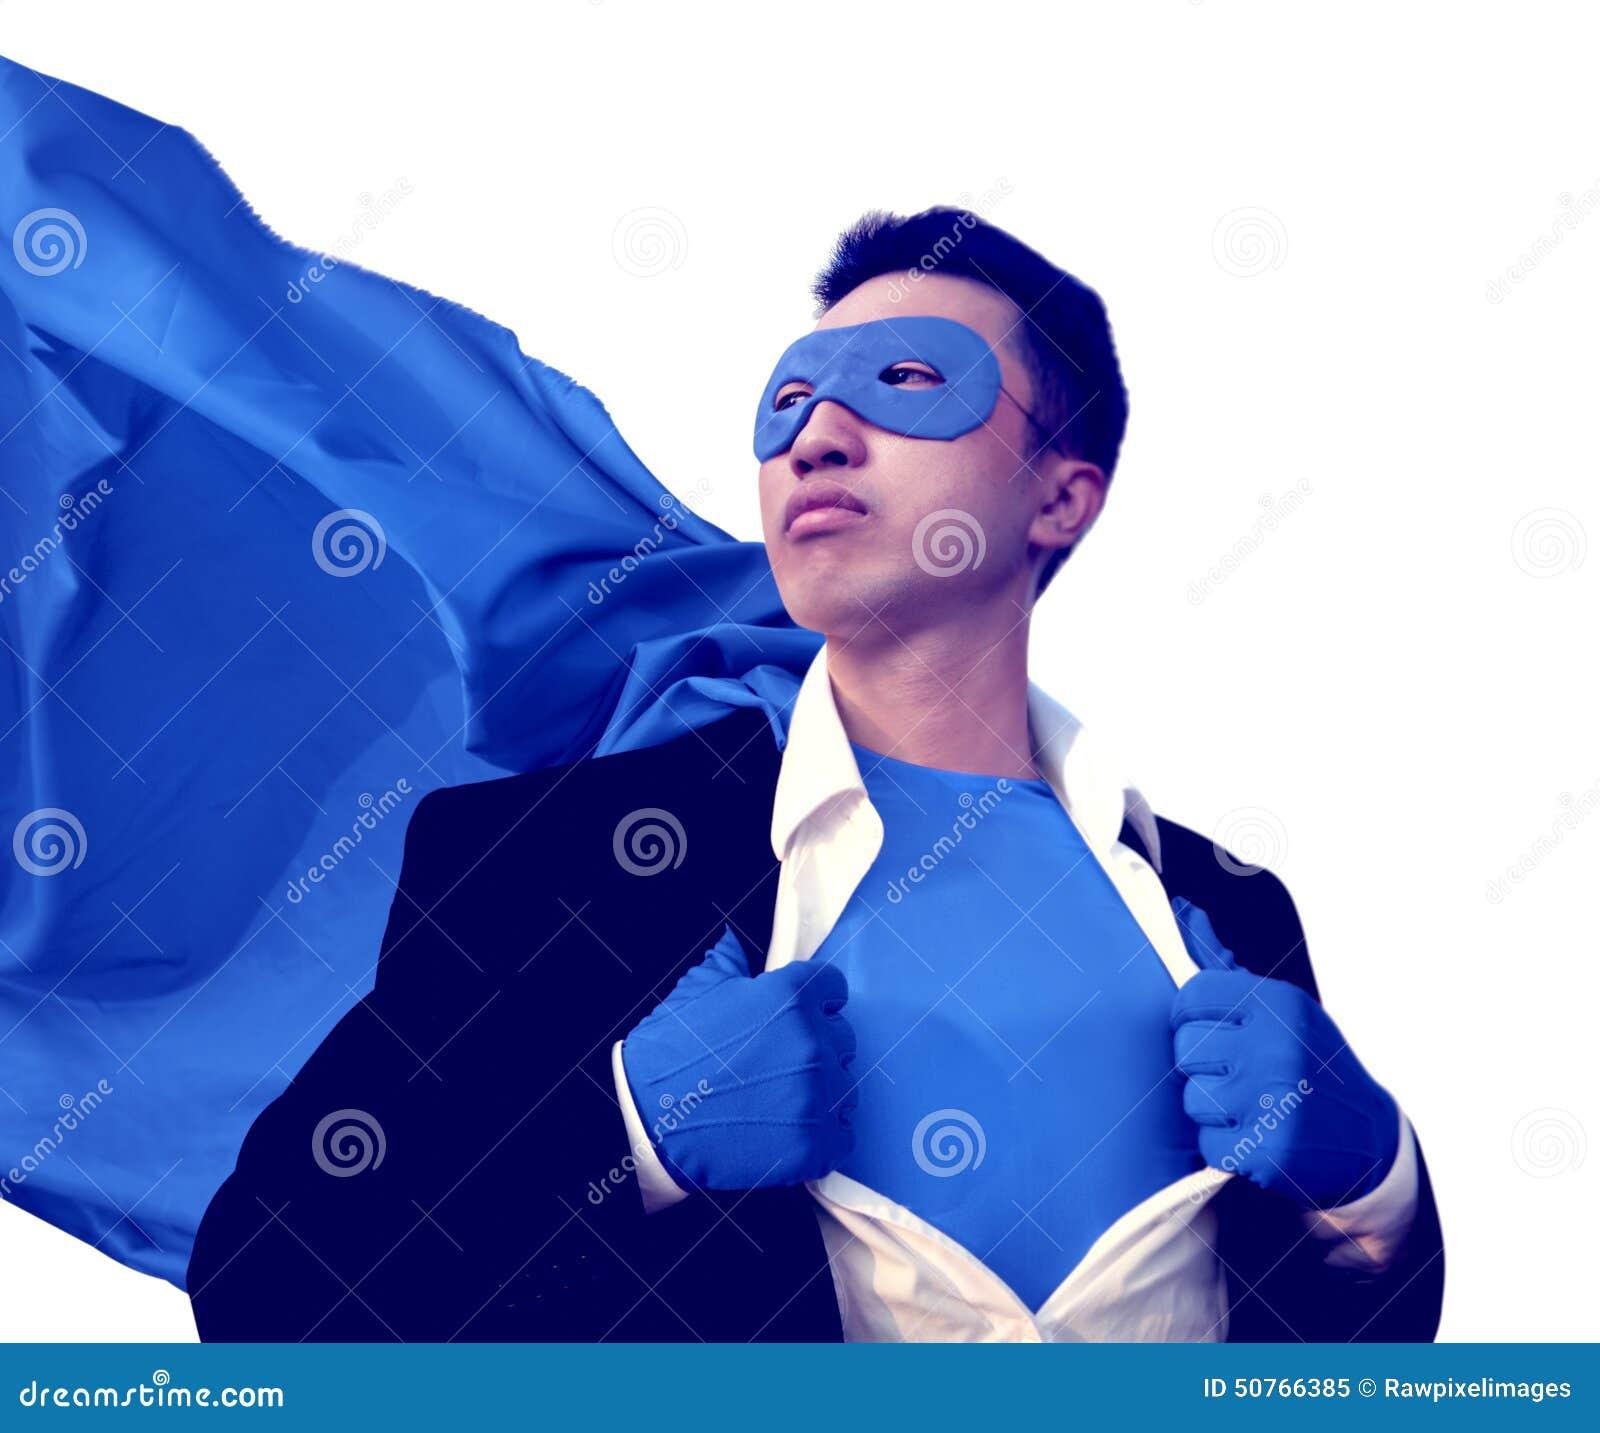 Superhero Protect Strong Victory Determination Fantasy Concept